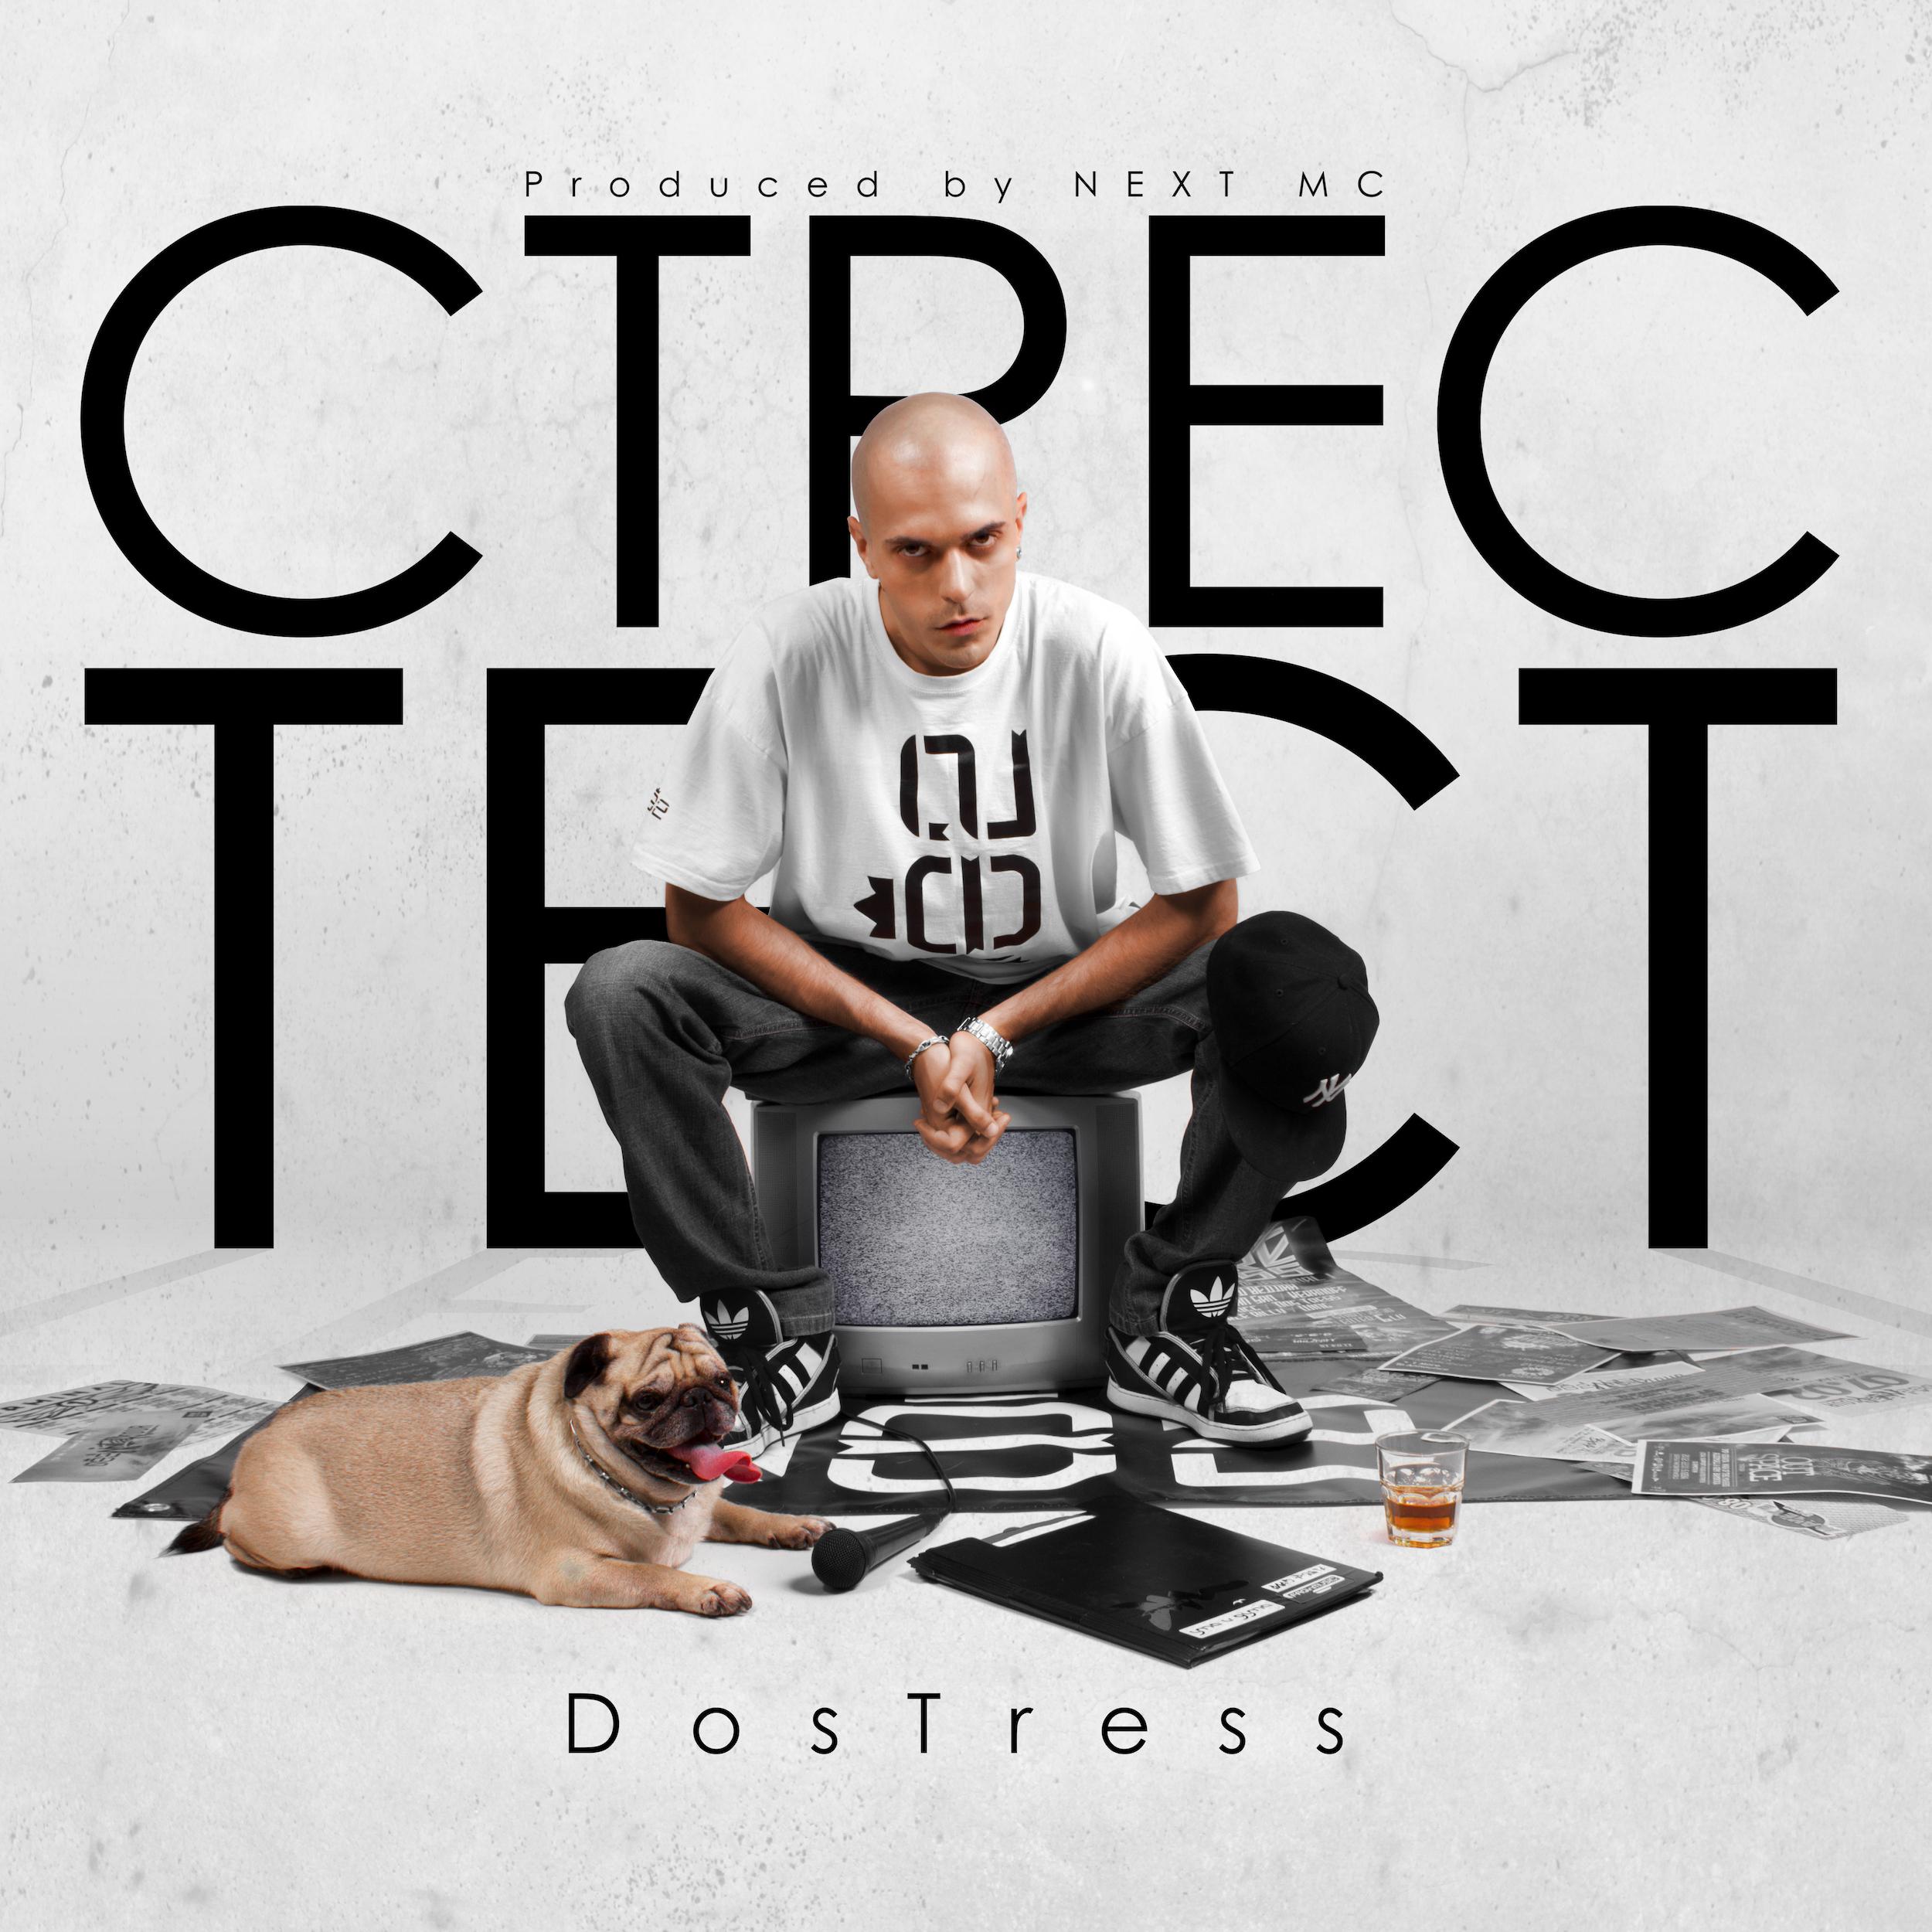 DosTress - Stres Test